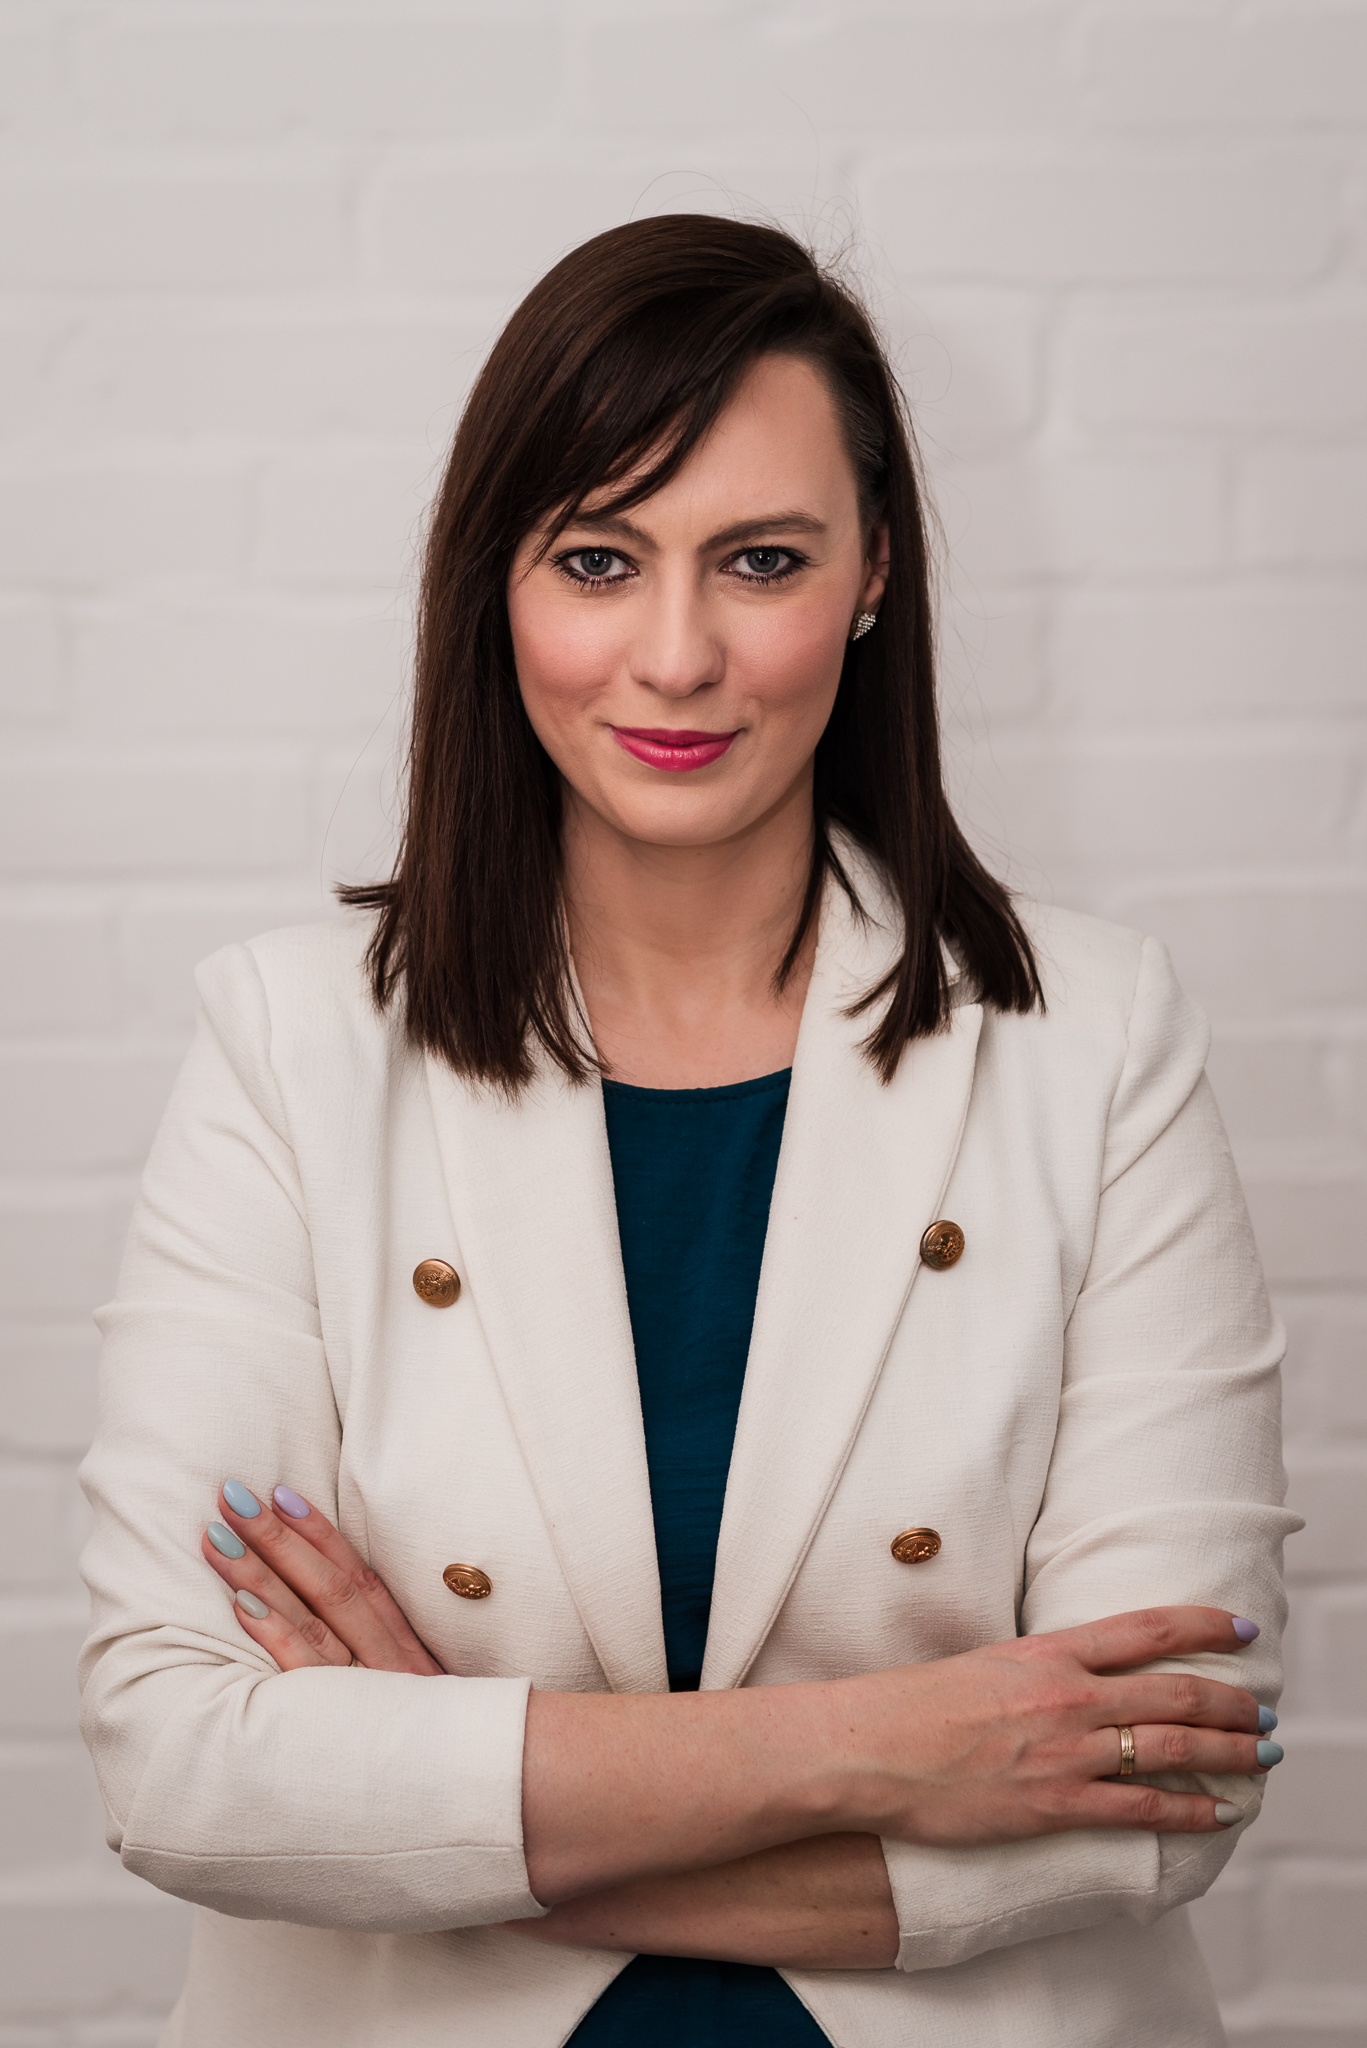 Monika Gluba